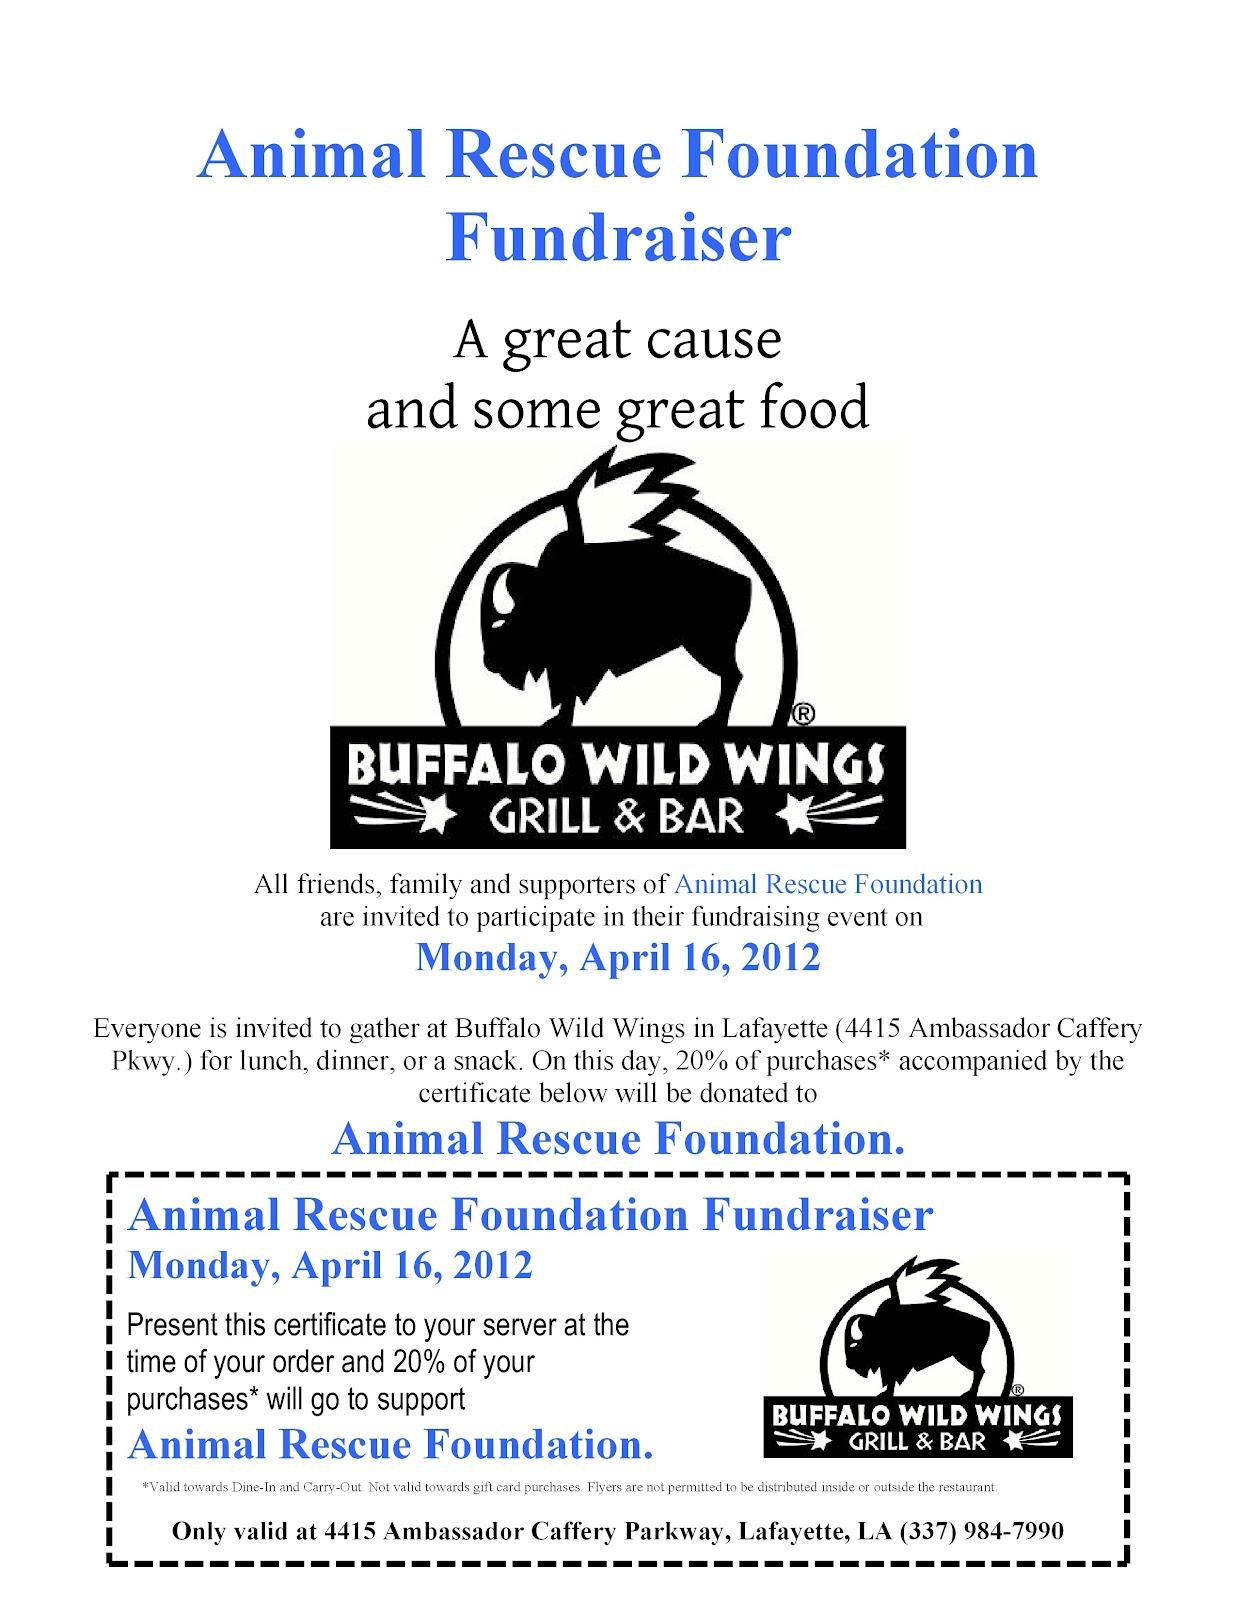 ARF-LA, Animal Rescue Foundation of LouisianA: Buffalo Wild Wings ...